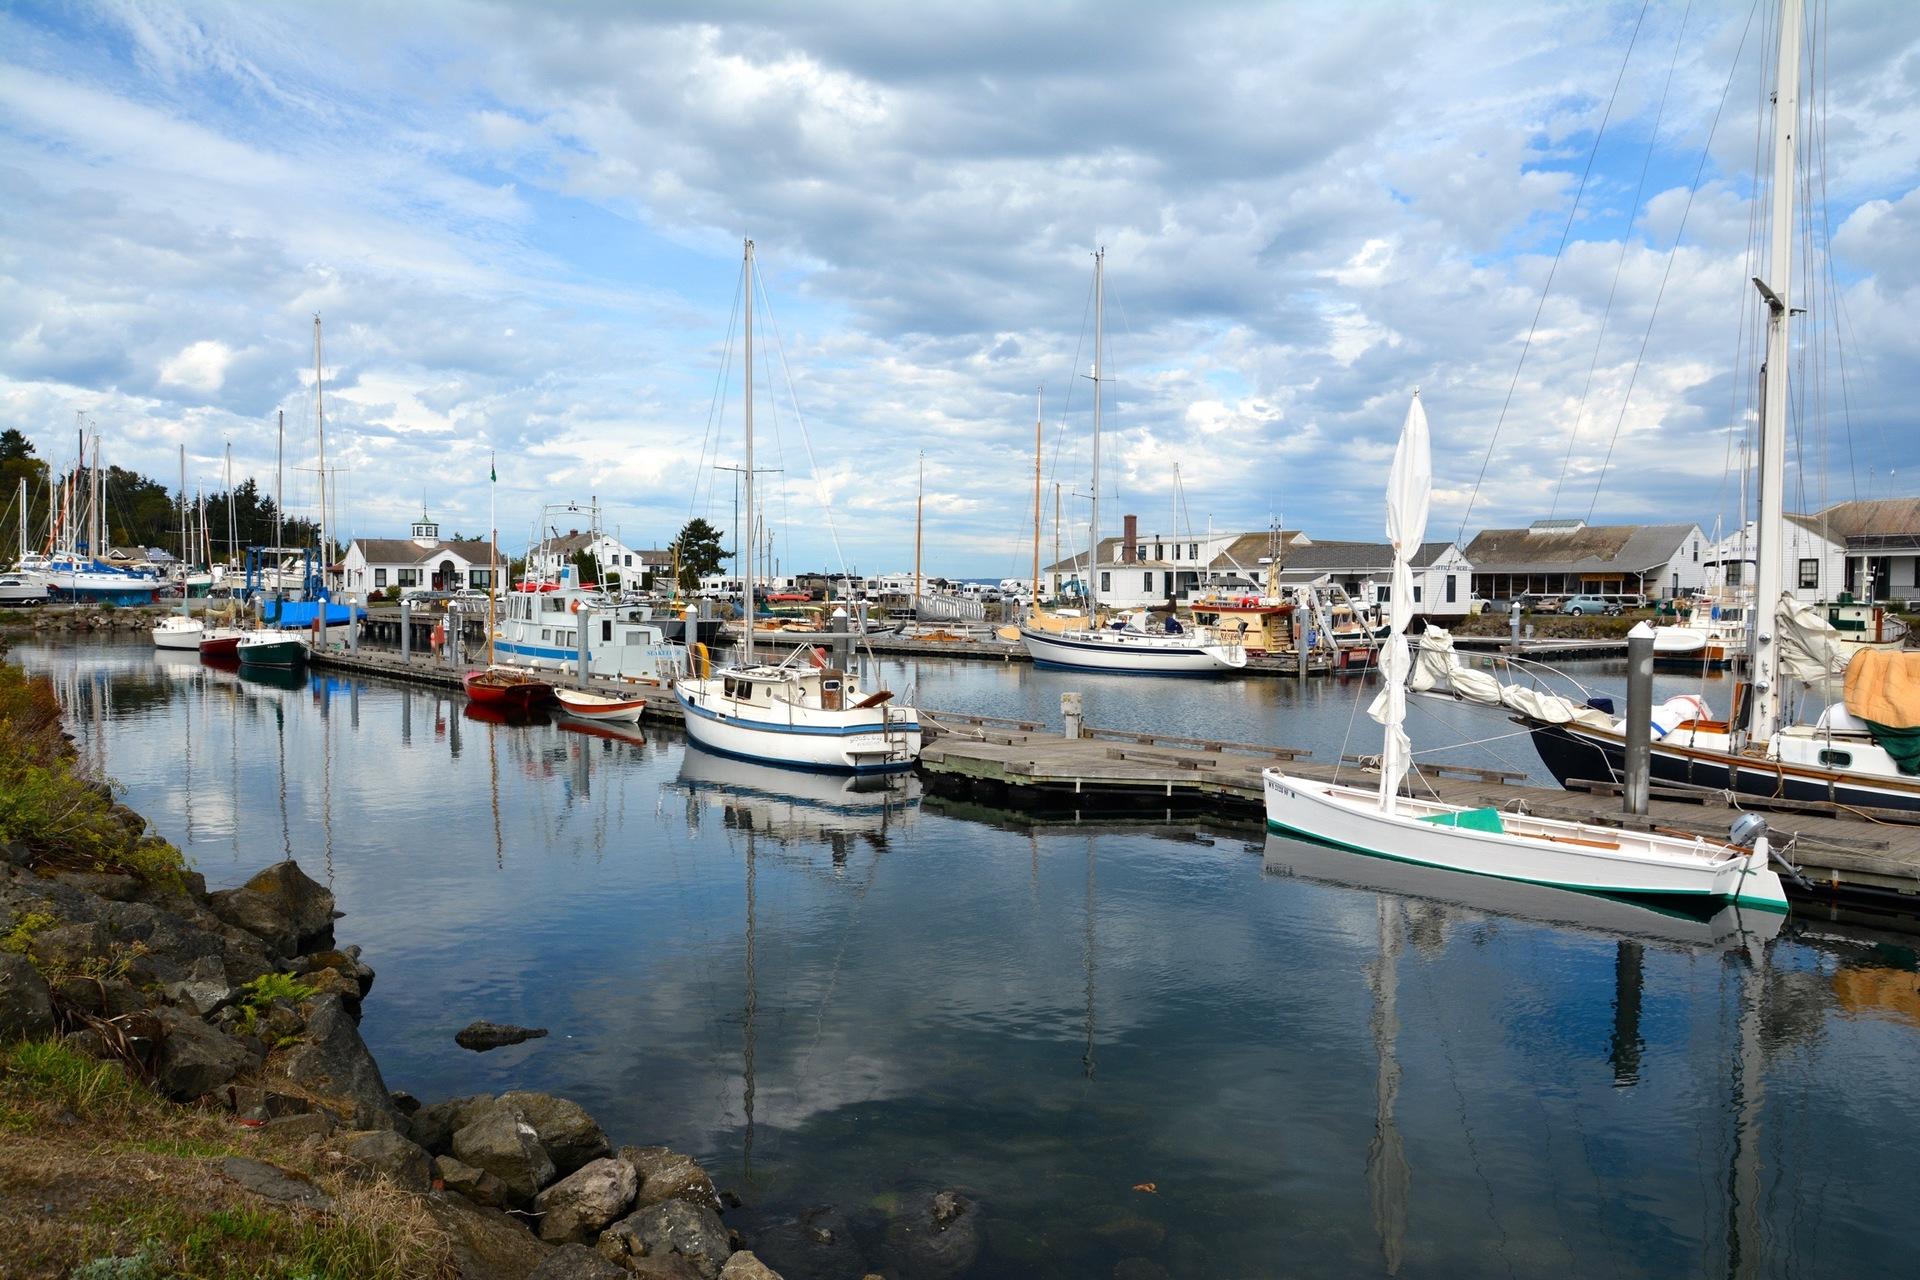 harbor | water, sea, marina, pier